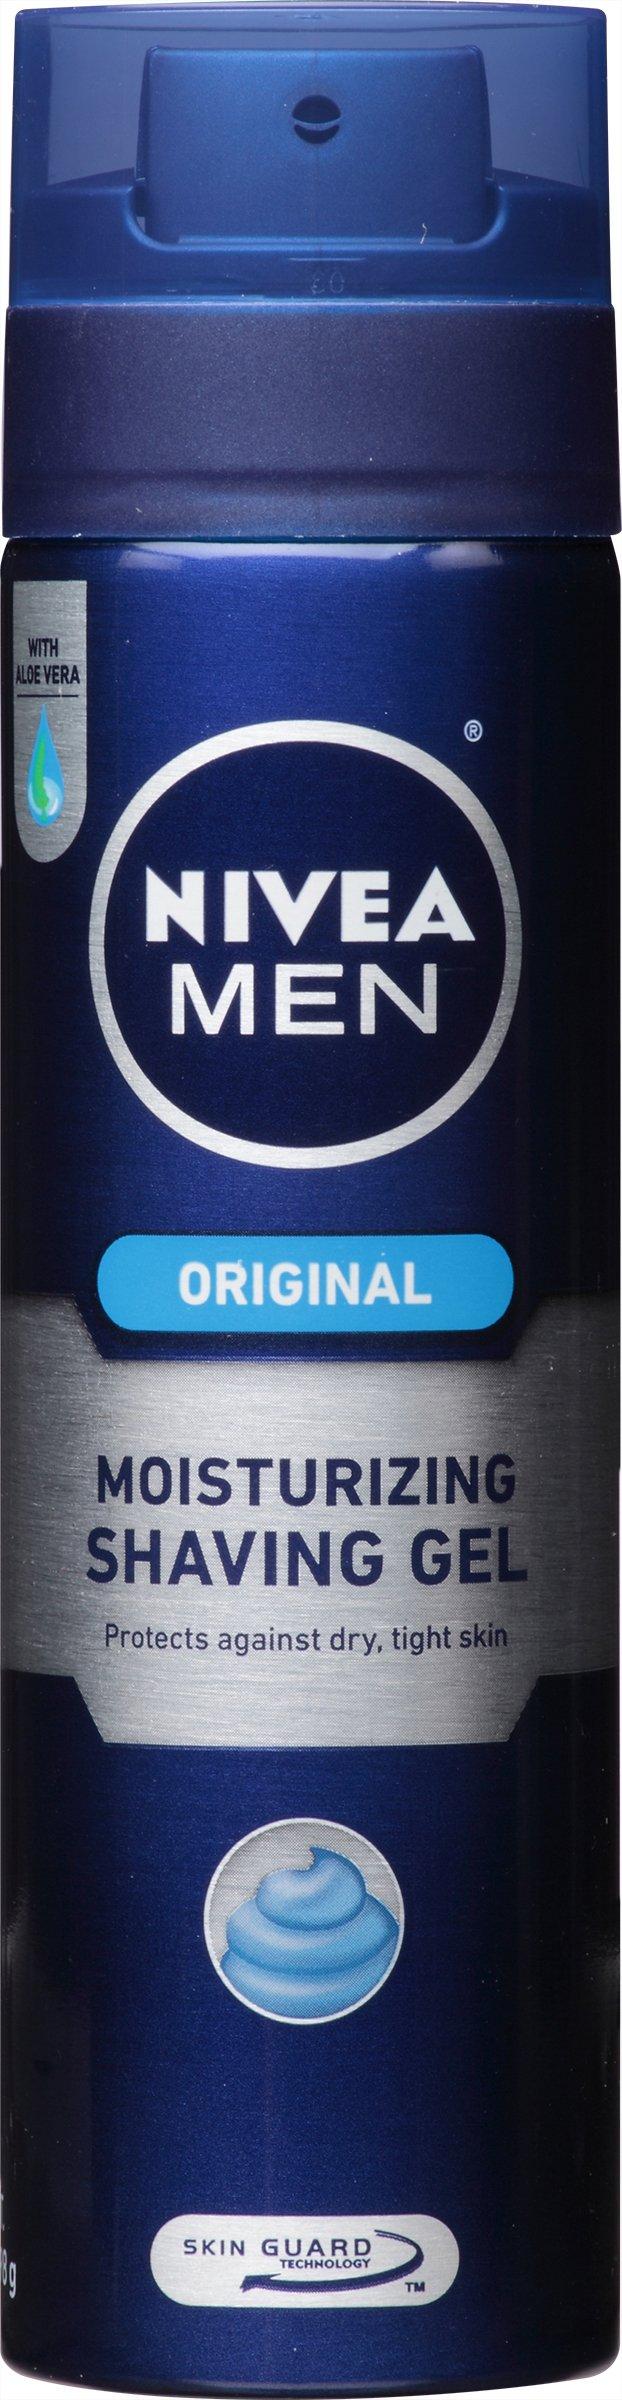 Nivea Men Moisturizing Shave Gel, 7-Ounce Canister (Pack of 12)